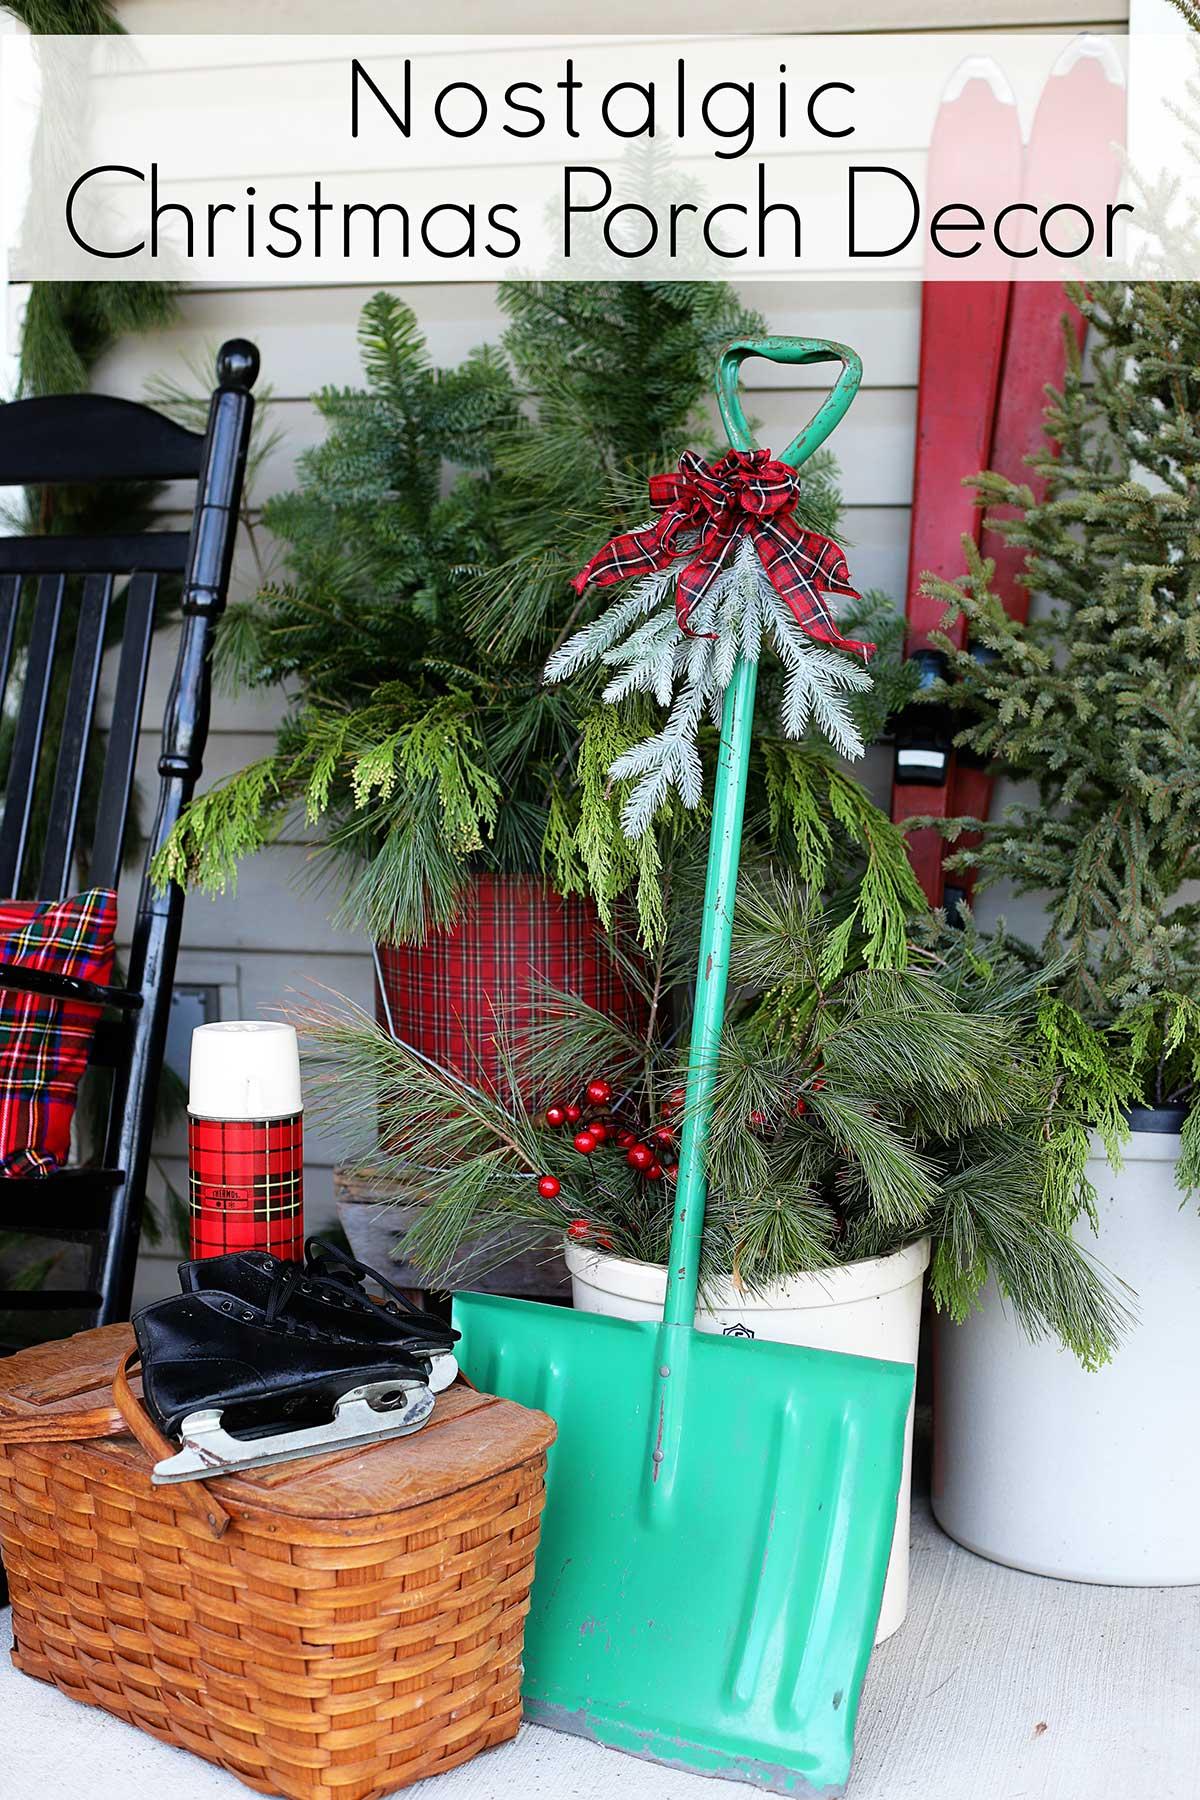 pinnable image for nostalgic Christmas porch decor